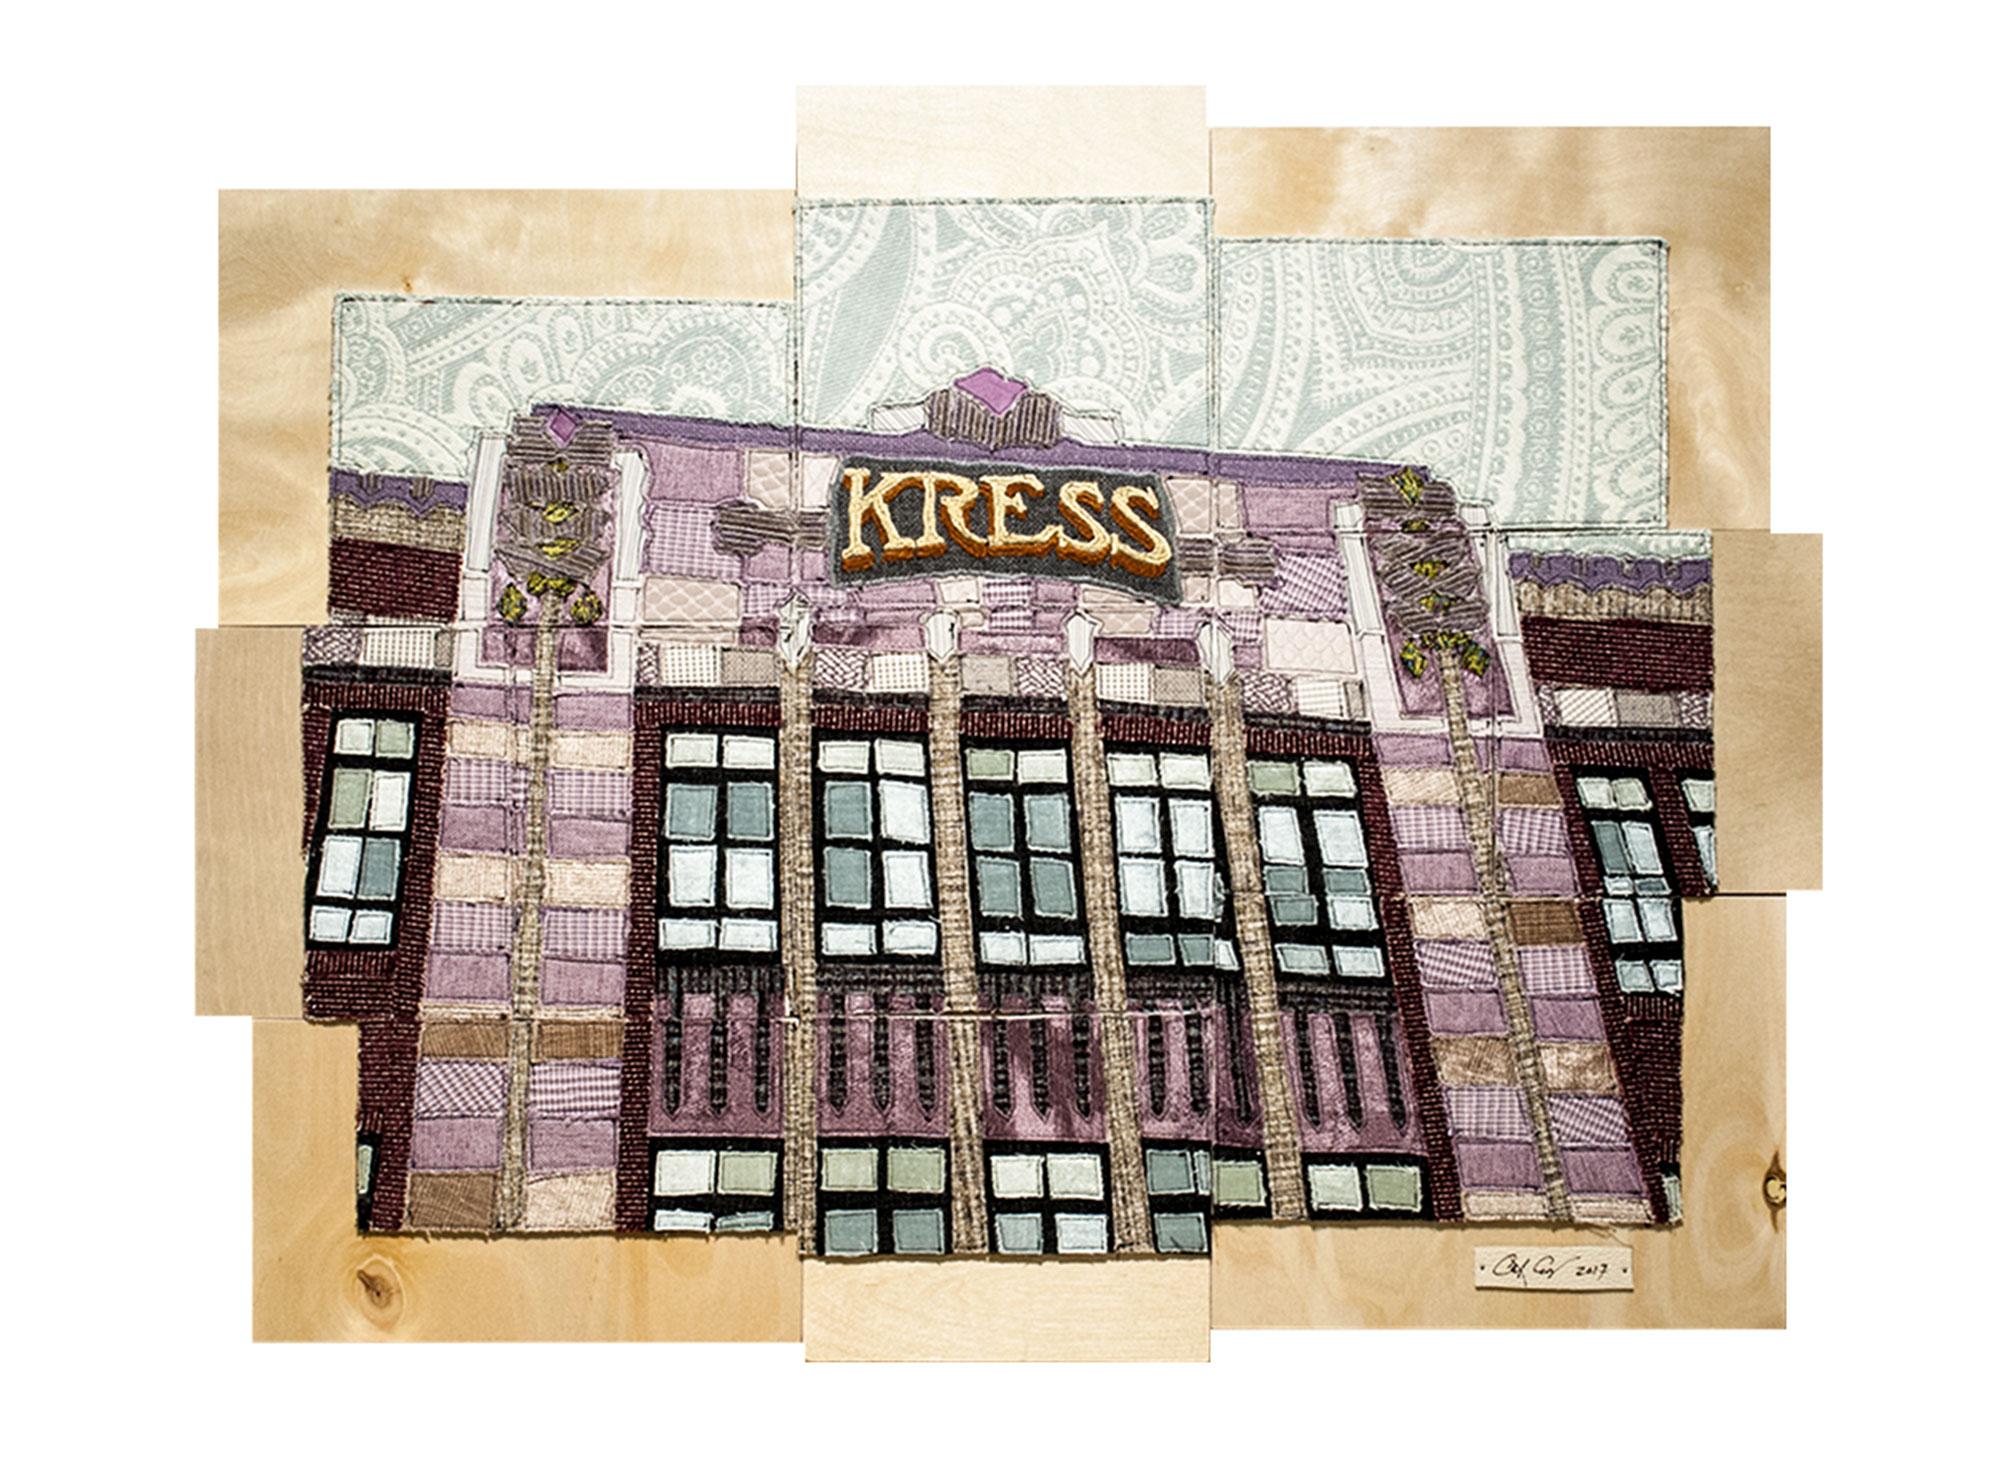 The Kress Building, Durham, NC, 2017